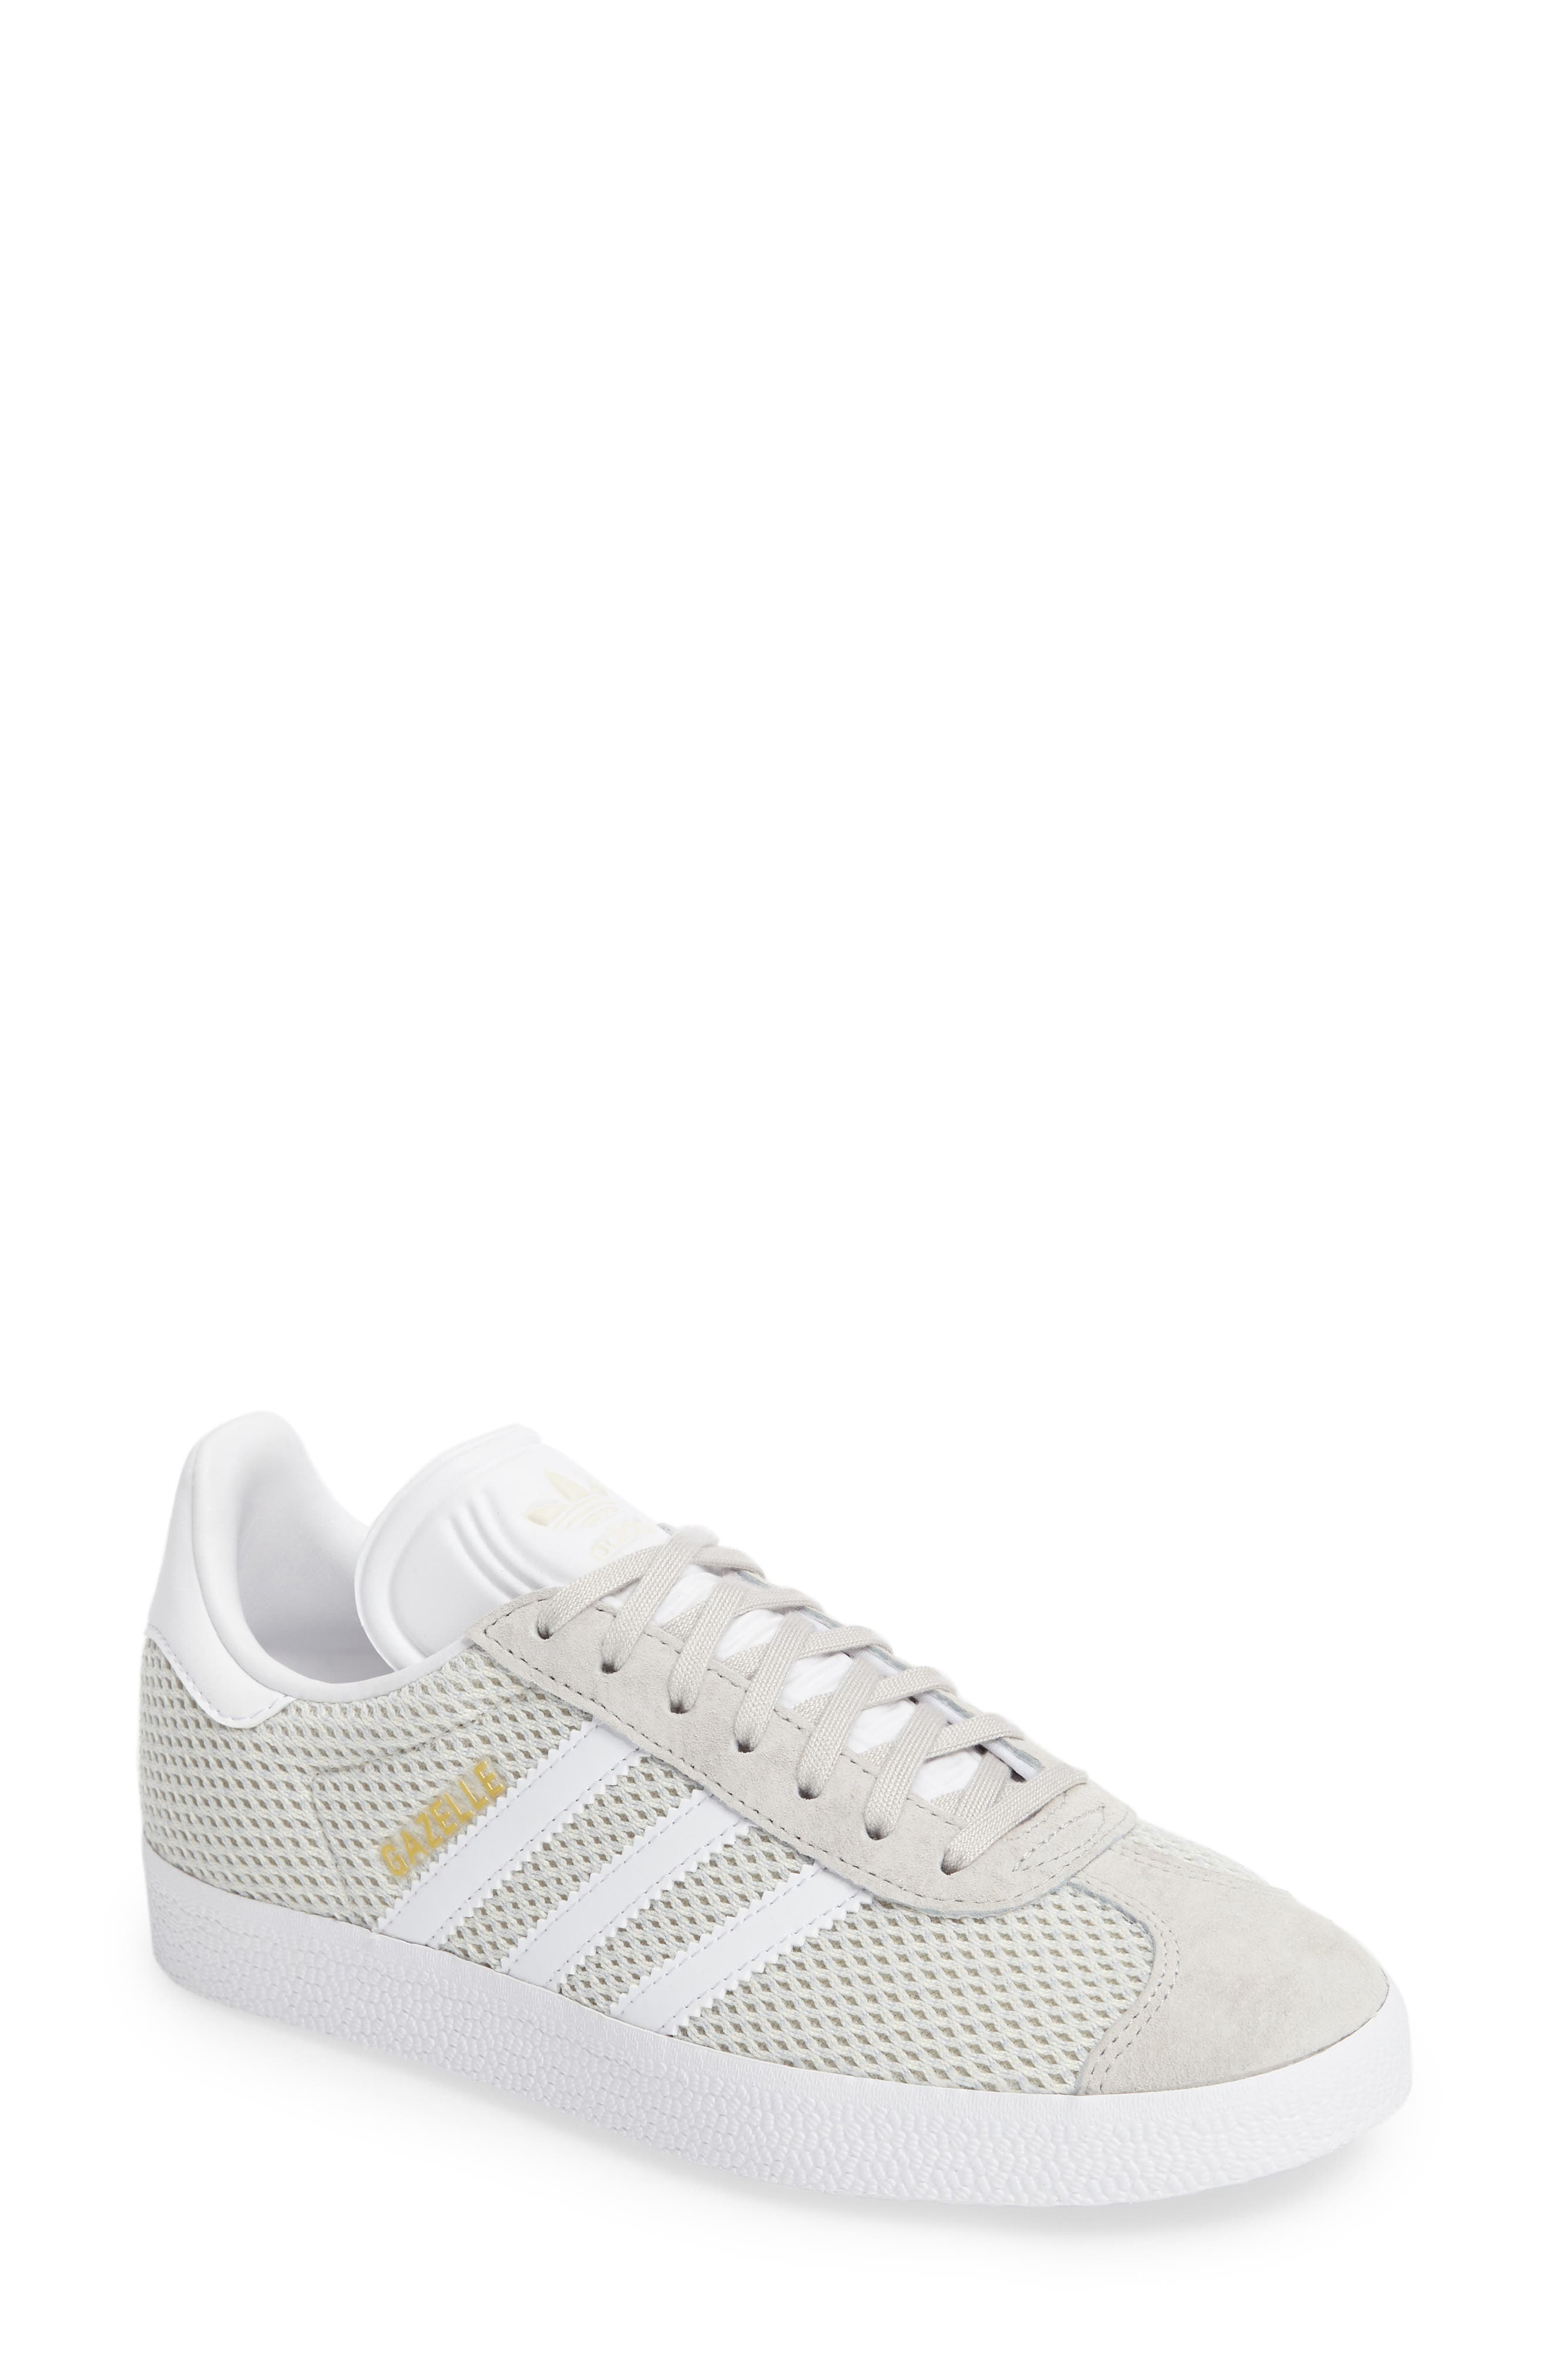 adidas sneakers. main image - adidas gazelle sneaker sneakers l